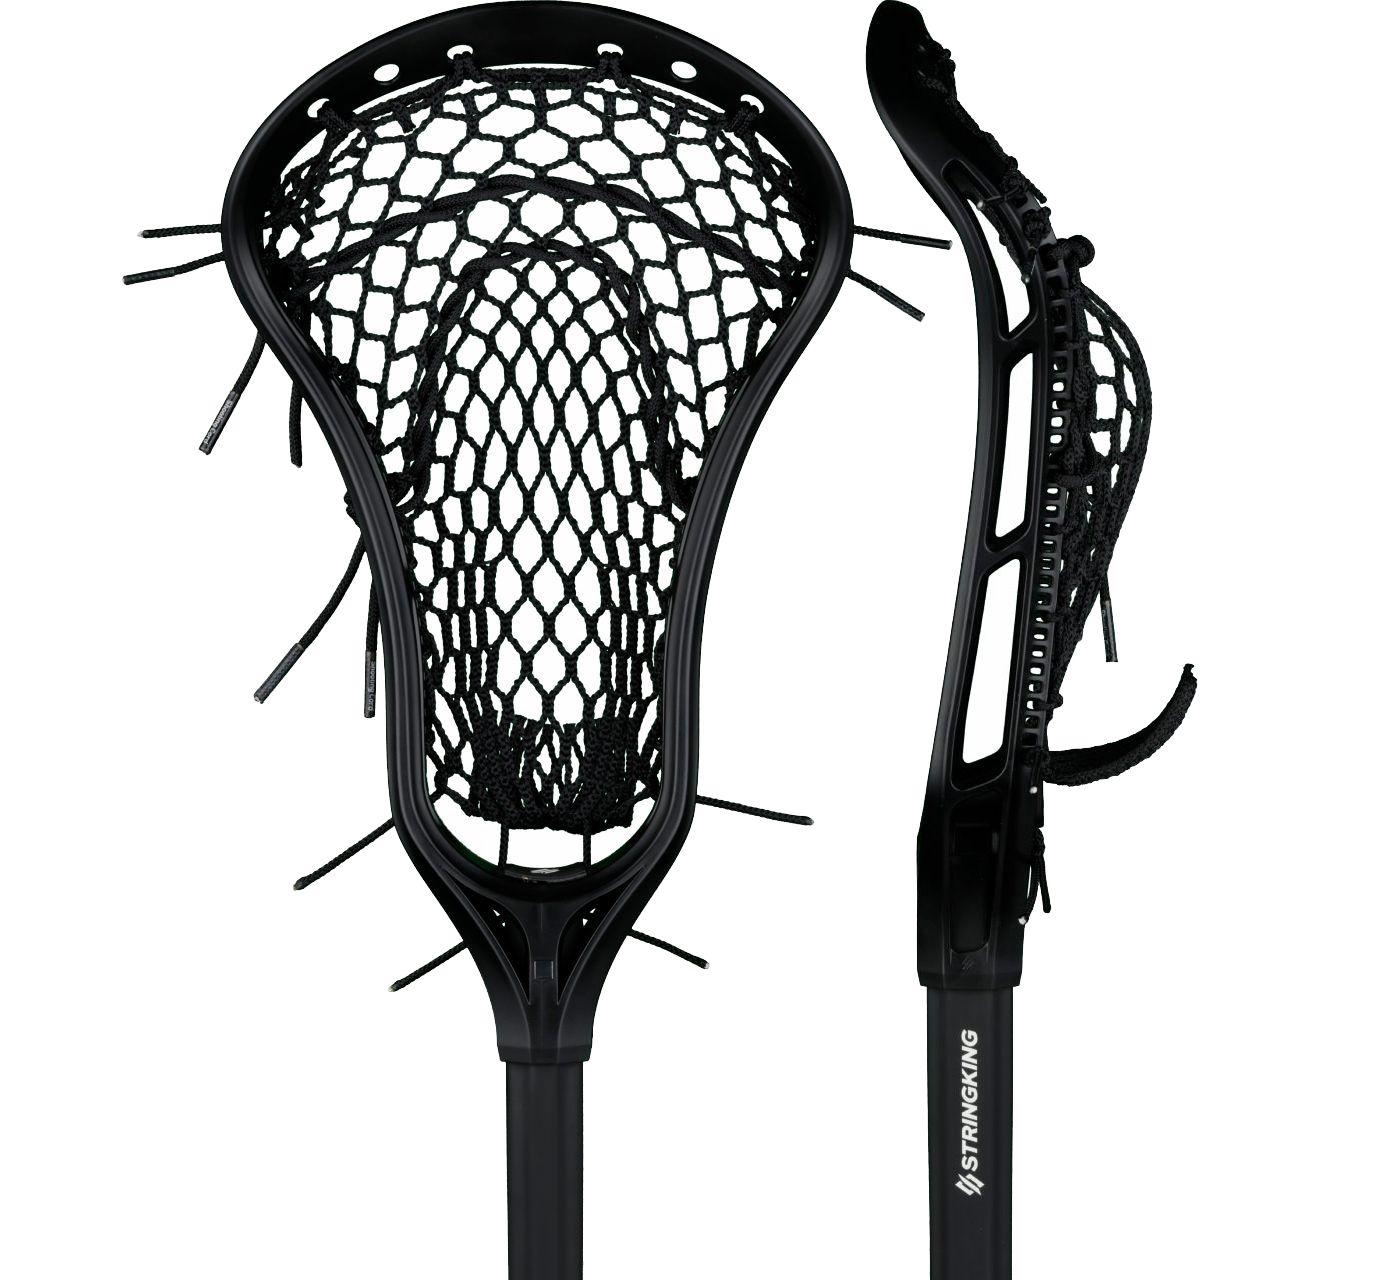 StringKing Women's Complete Metal Lacrosse Stick